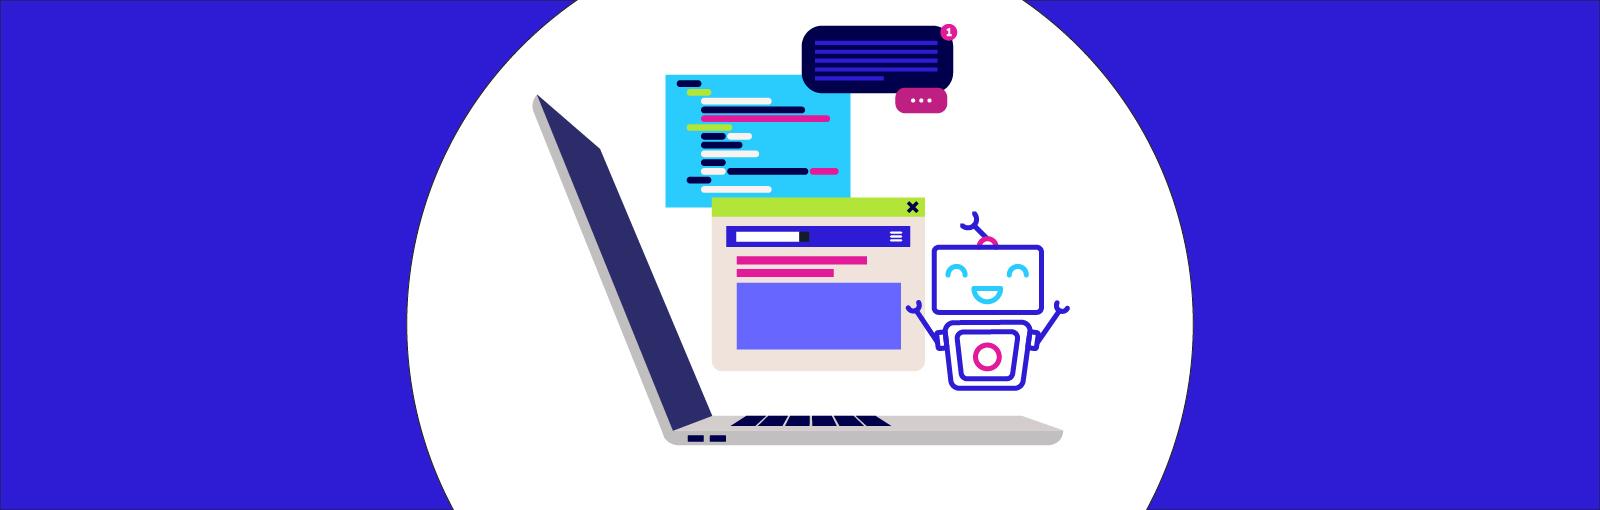 More than buzzwords: How AI & ML transform customer care